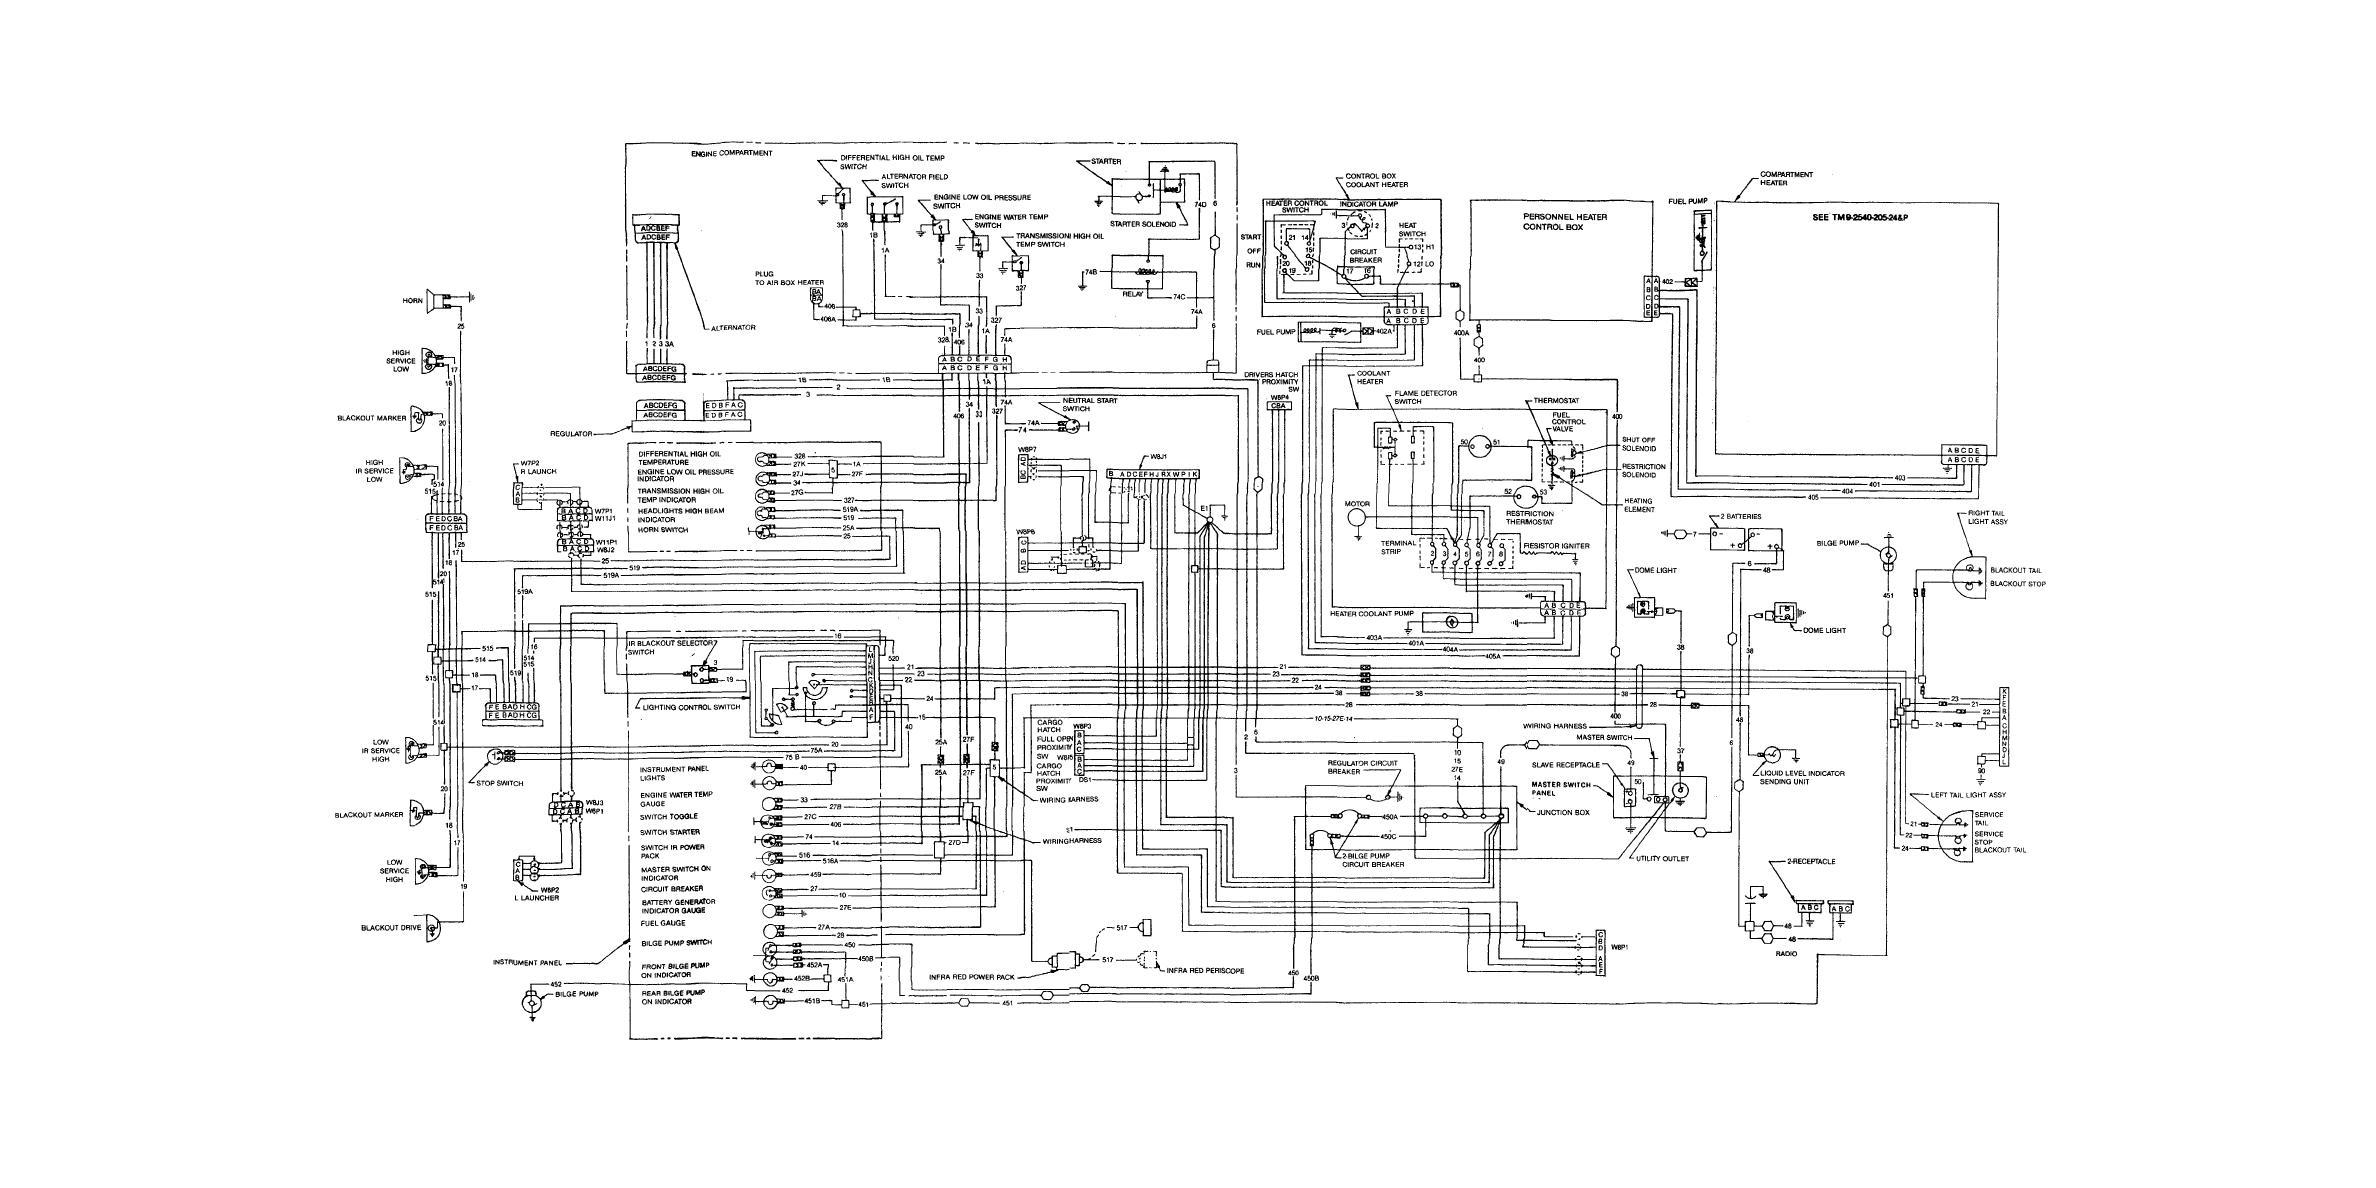 m1064 electrical wiring diagram 200 amp 825760749